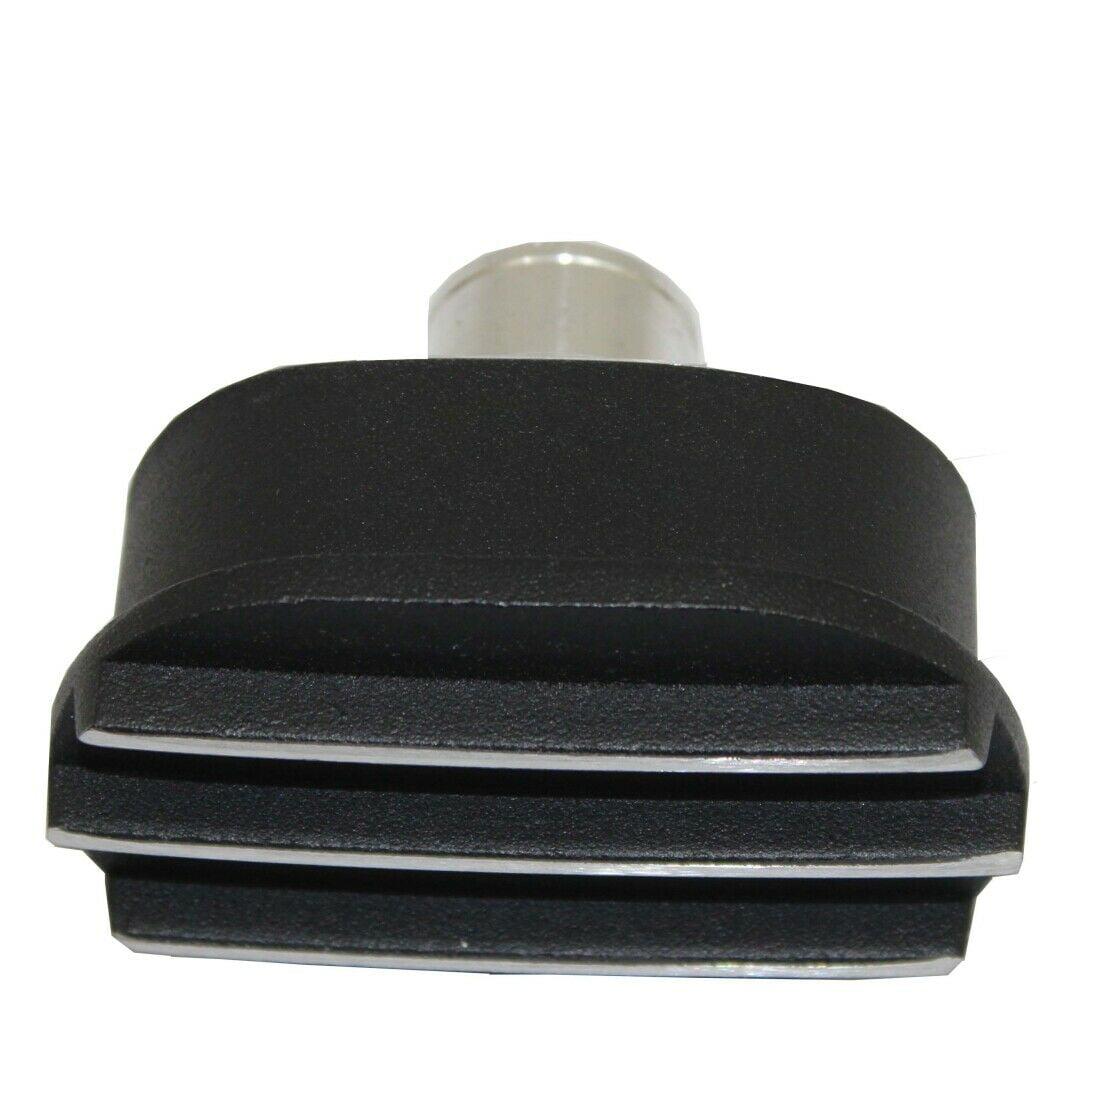 Black Finned Oval Polished Aluminum Valve Cover Breather /& PCV Valve Combo SBC